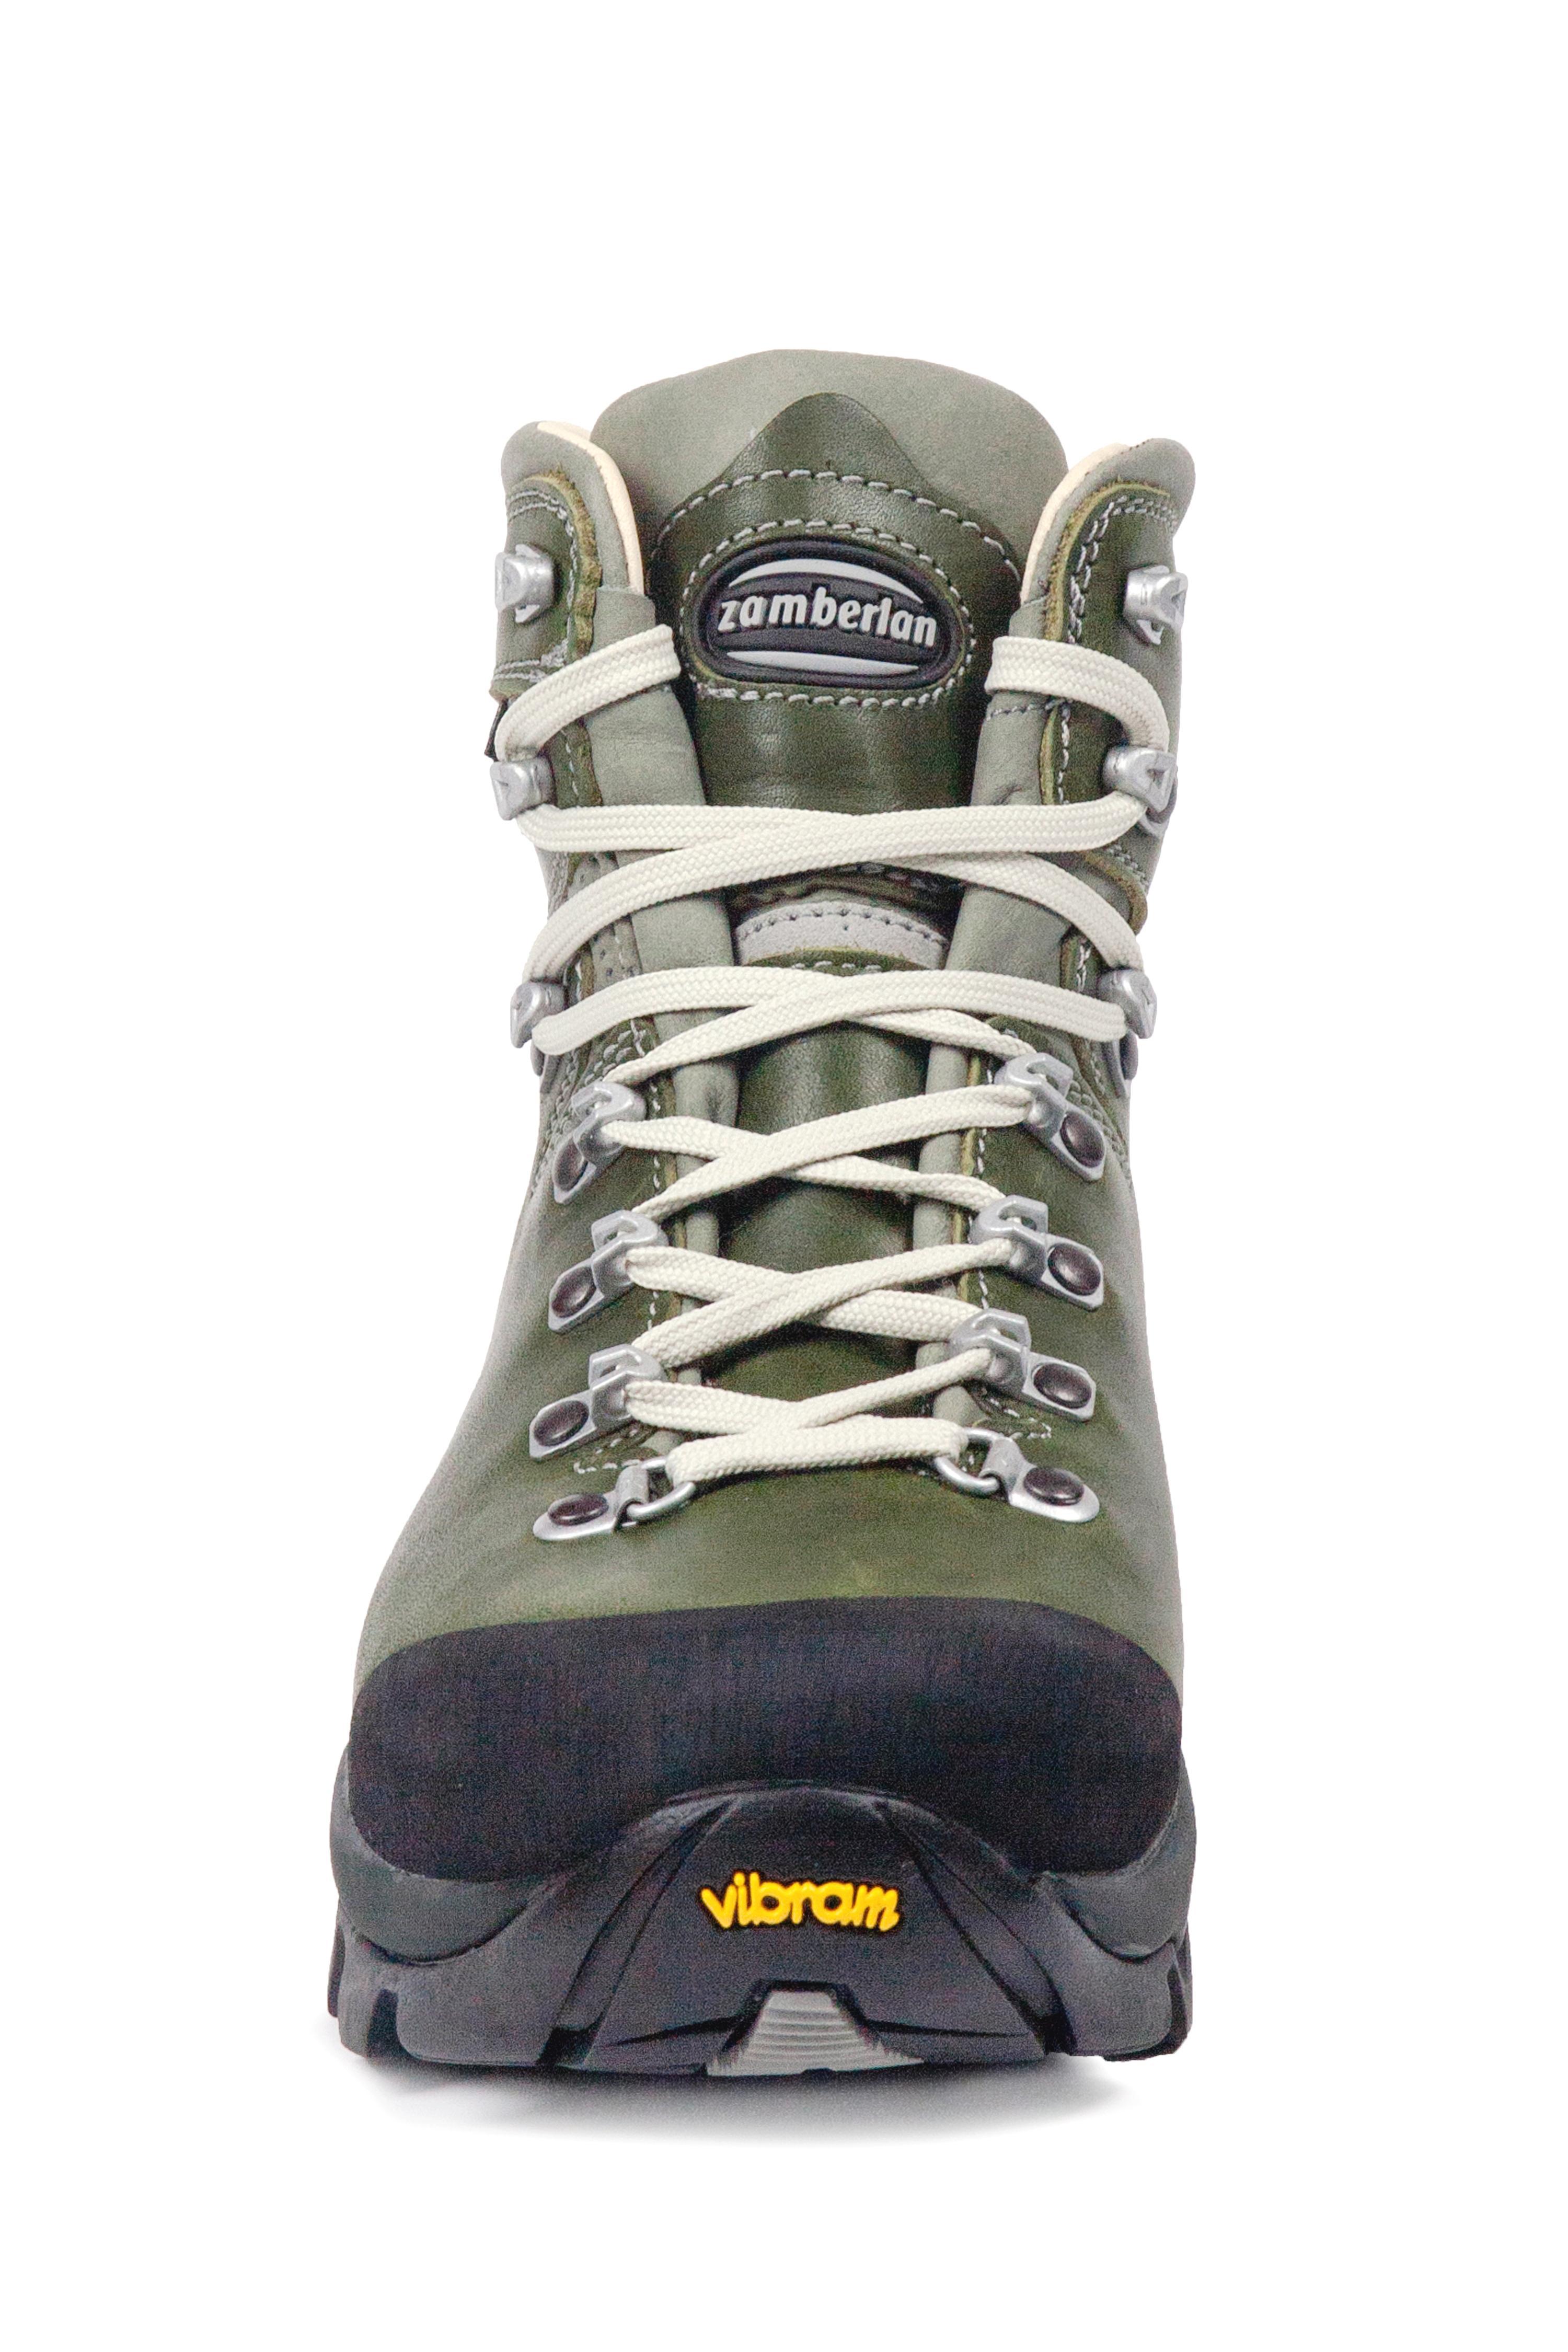 961fa153622 1996 VIOZ LUX GTX® RR WNS - Dark Green Women's Trekking Boots Zamberlan    Zamberlan